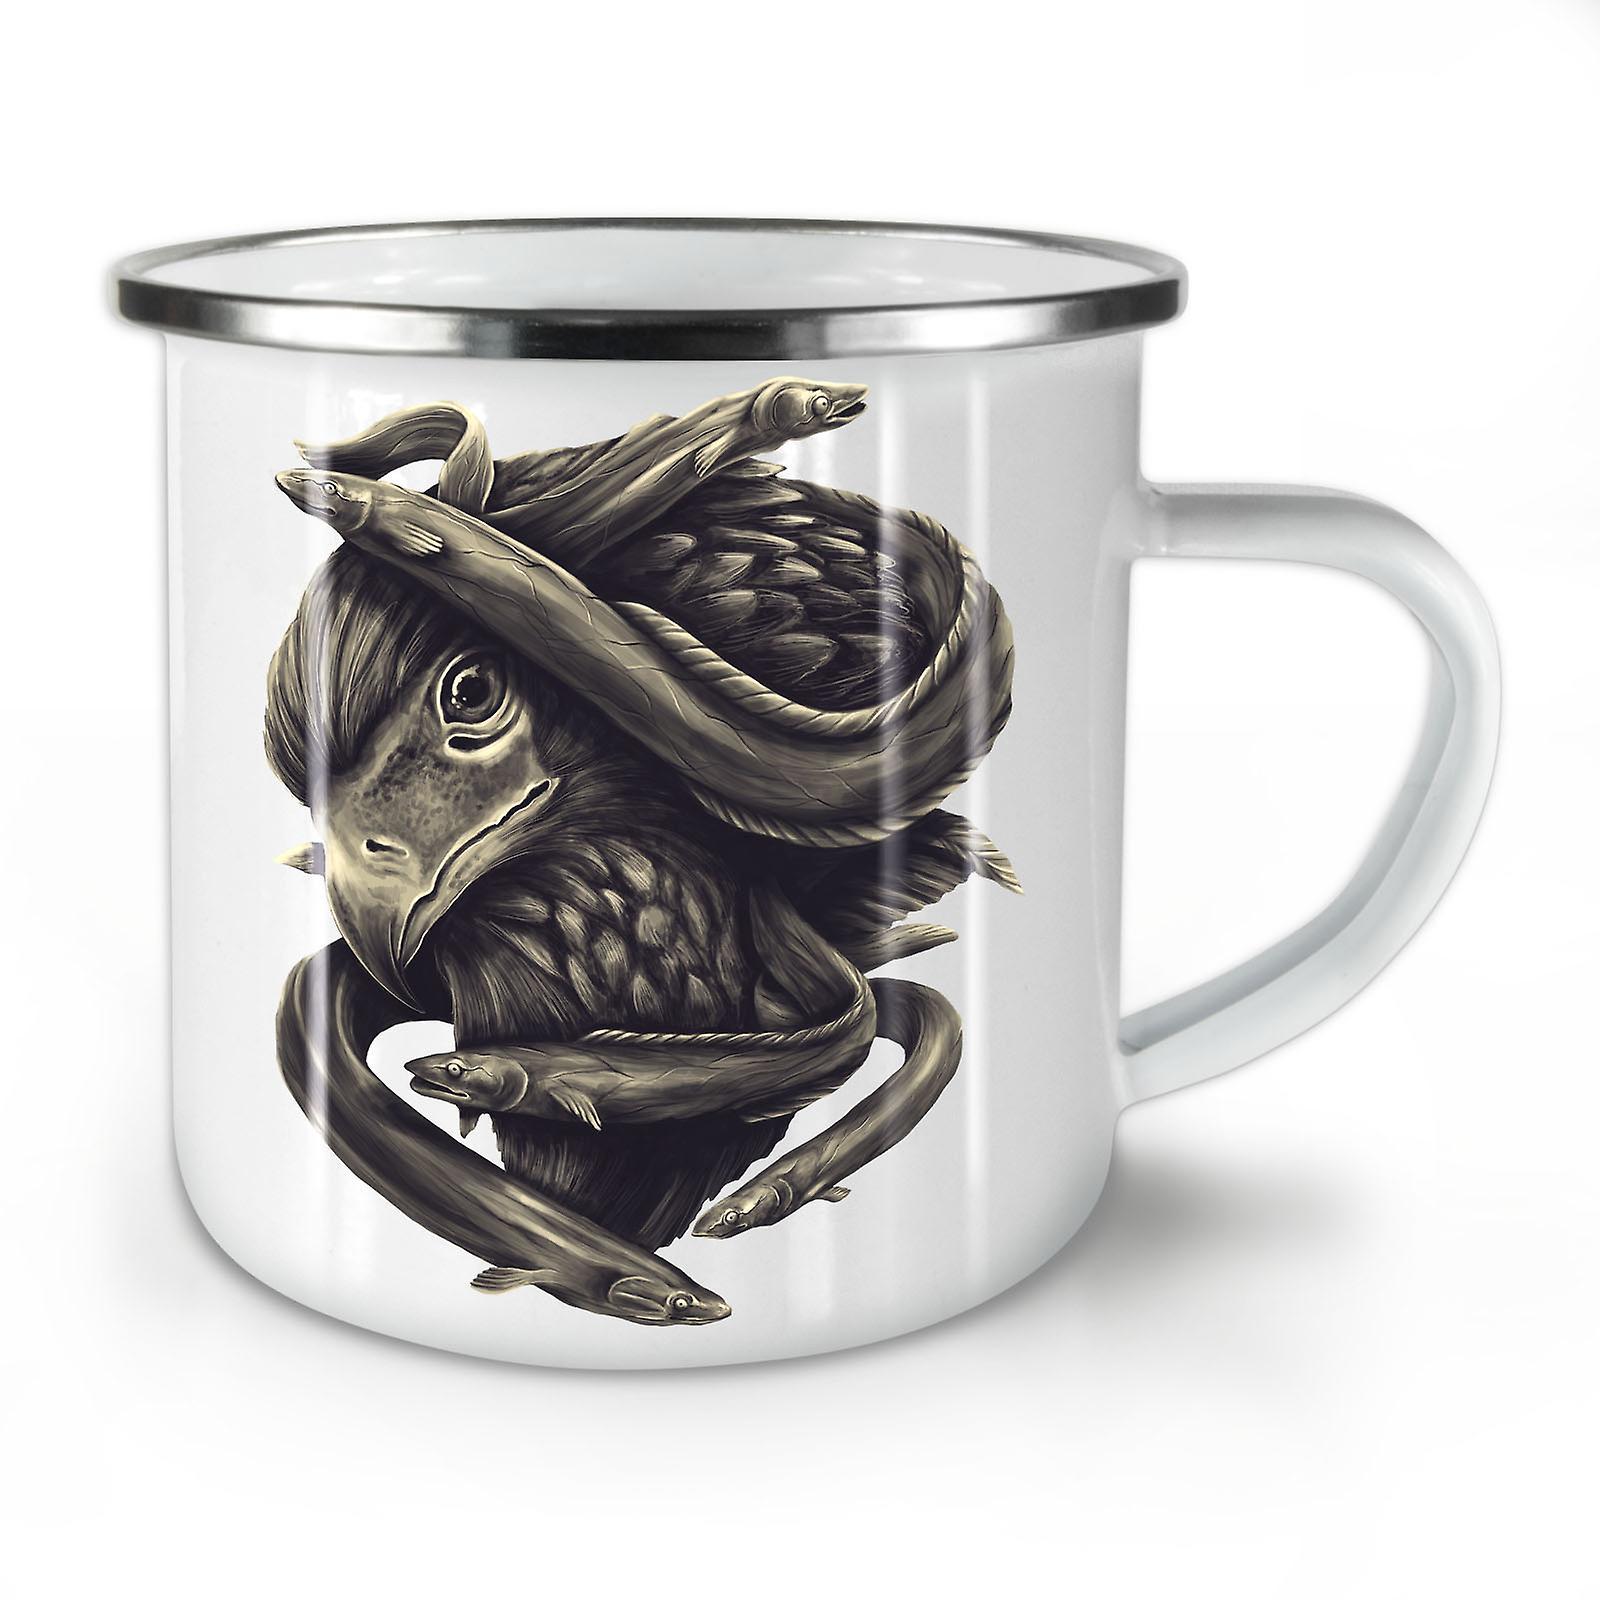 Mug10 Café Whitetea Fish Nouveau Animal OzWellcoda Eagle Head Émail yNwP8nm0vO